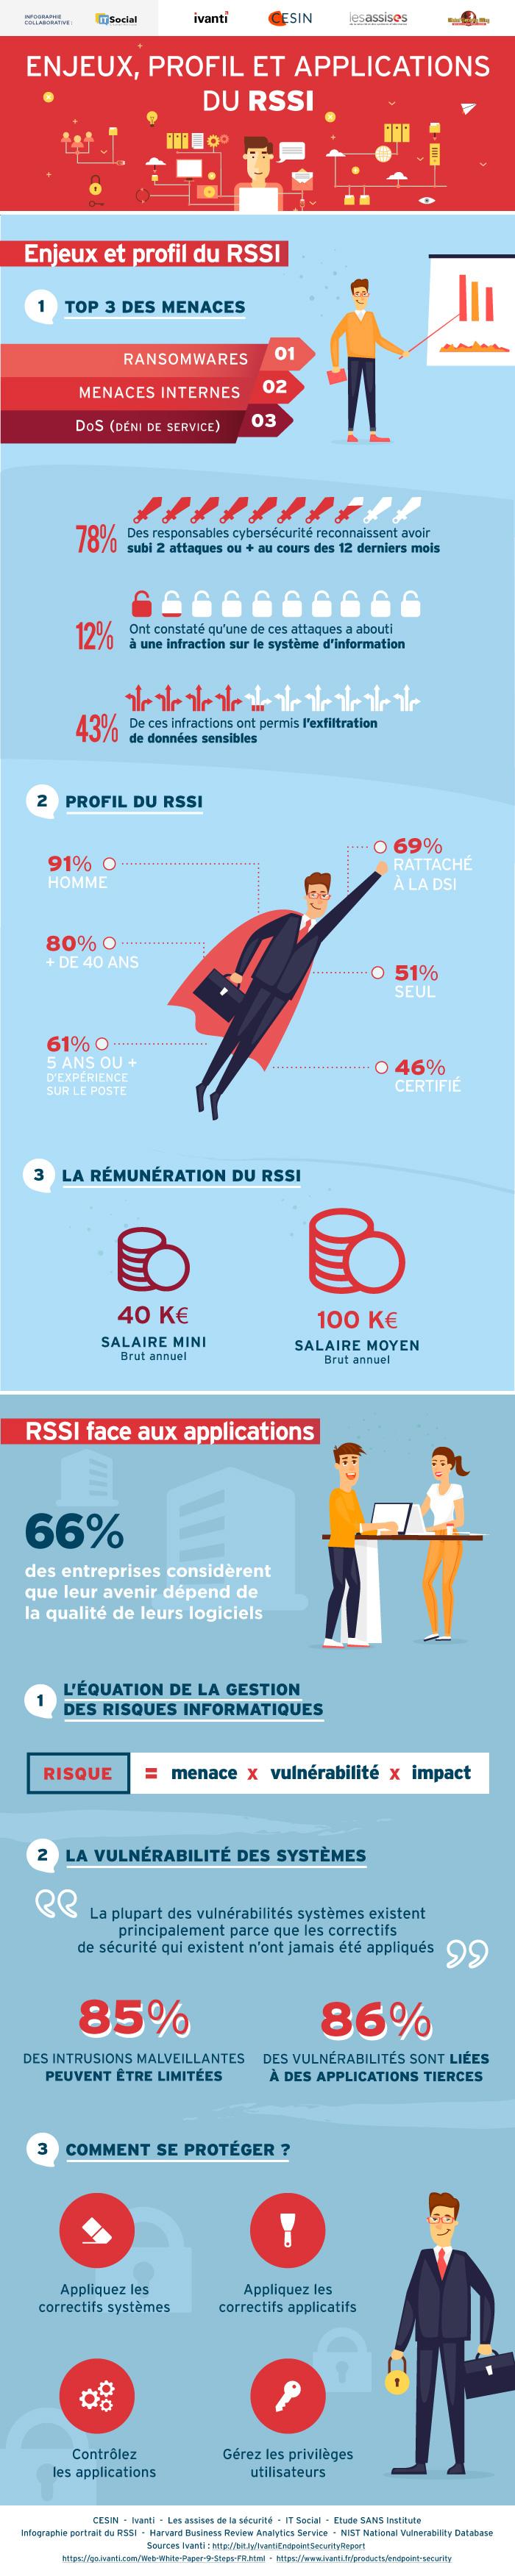 infographie-enjeux-profil-rssi